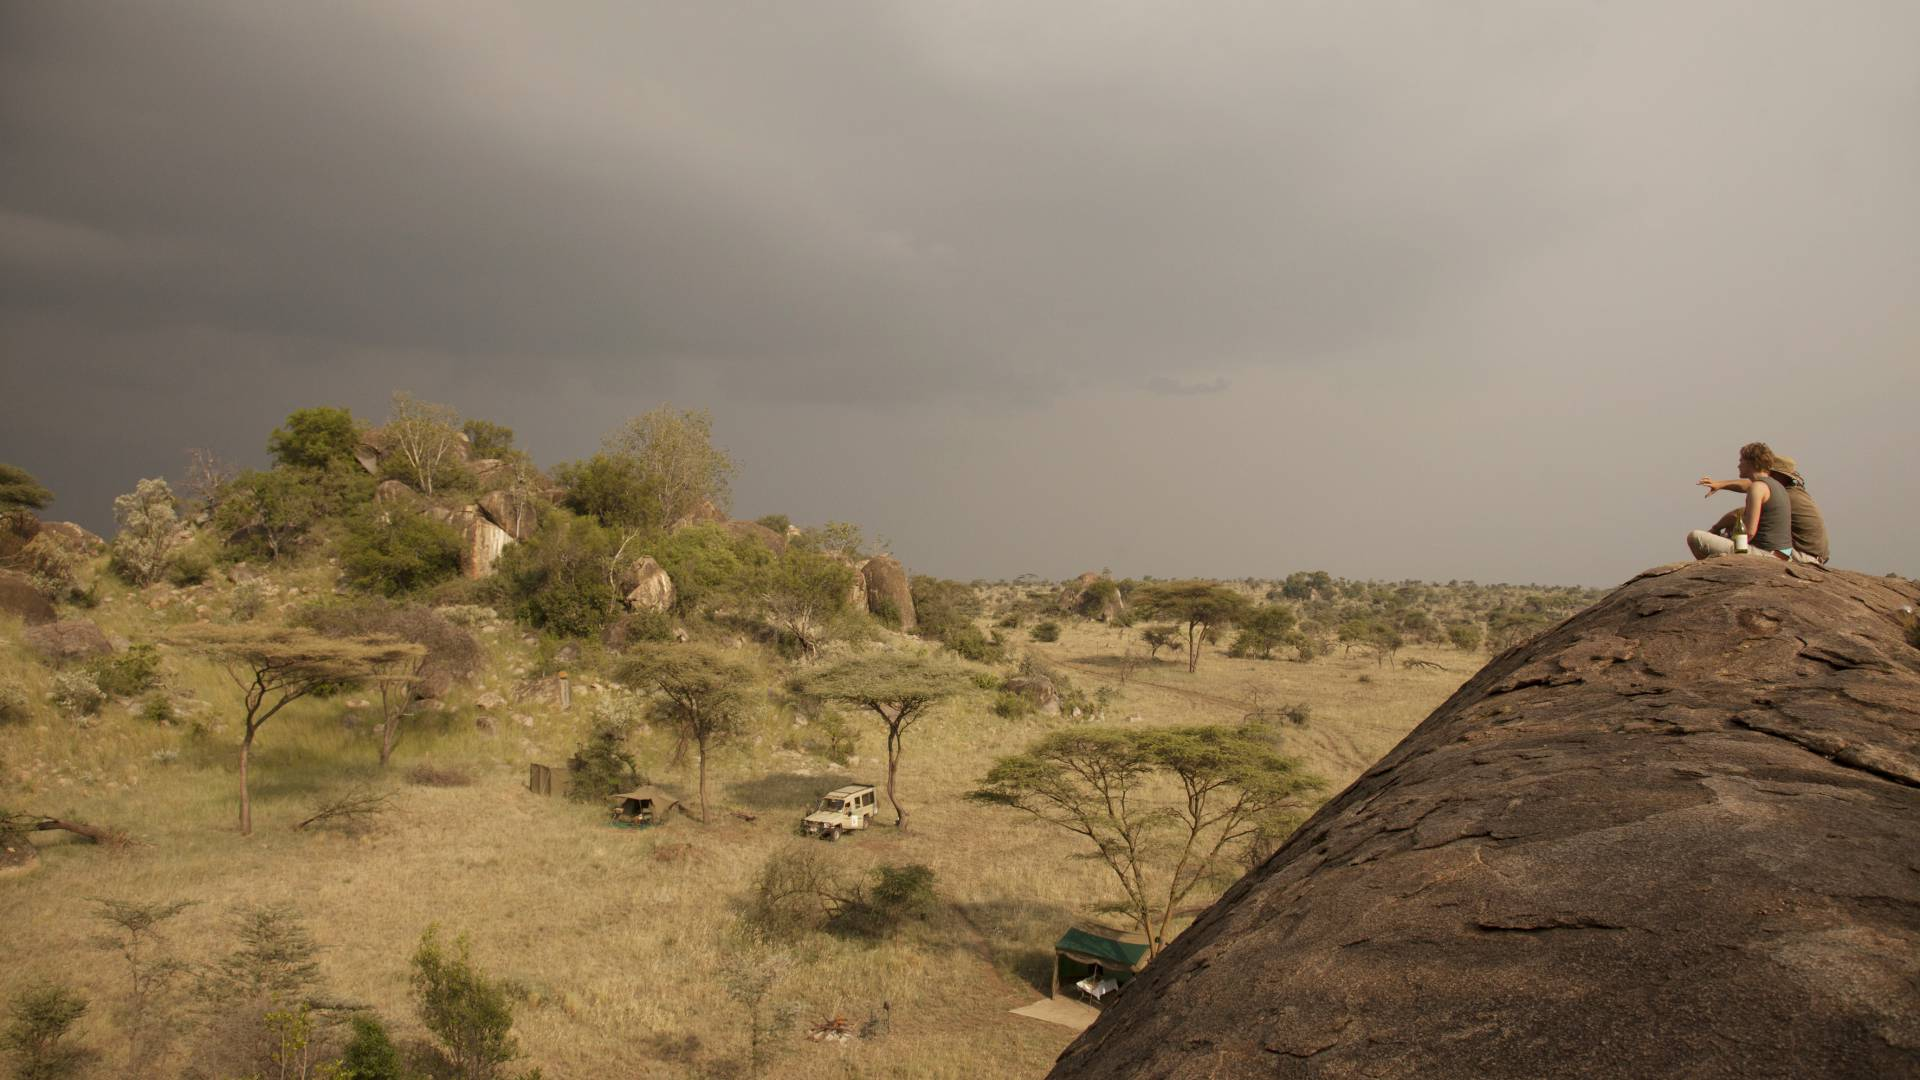 Pinto Africa Top Safari Tips 2018 - Wayo walking safari serengeti